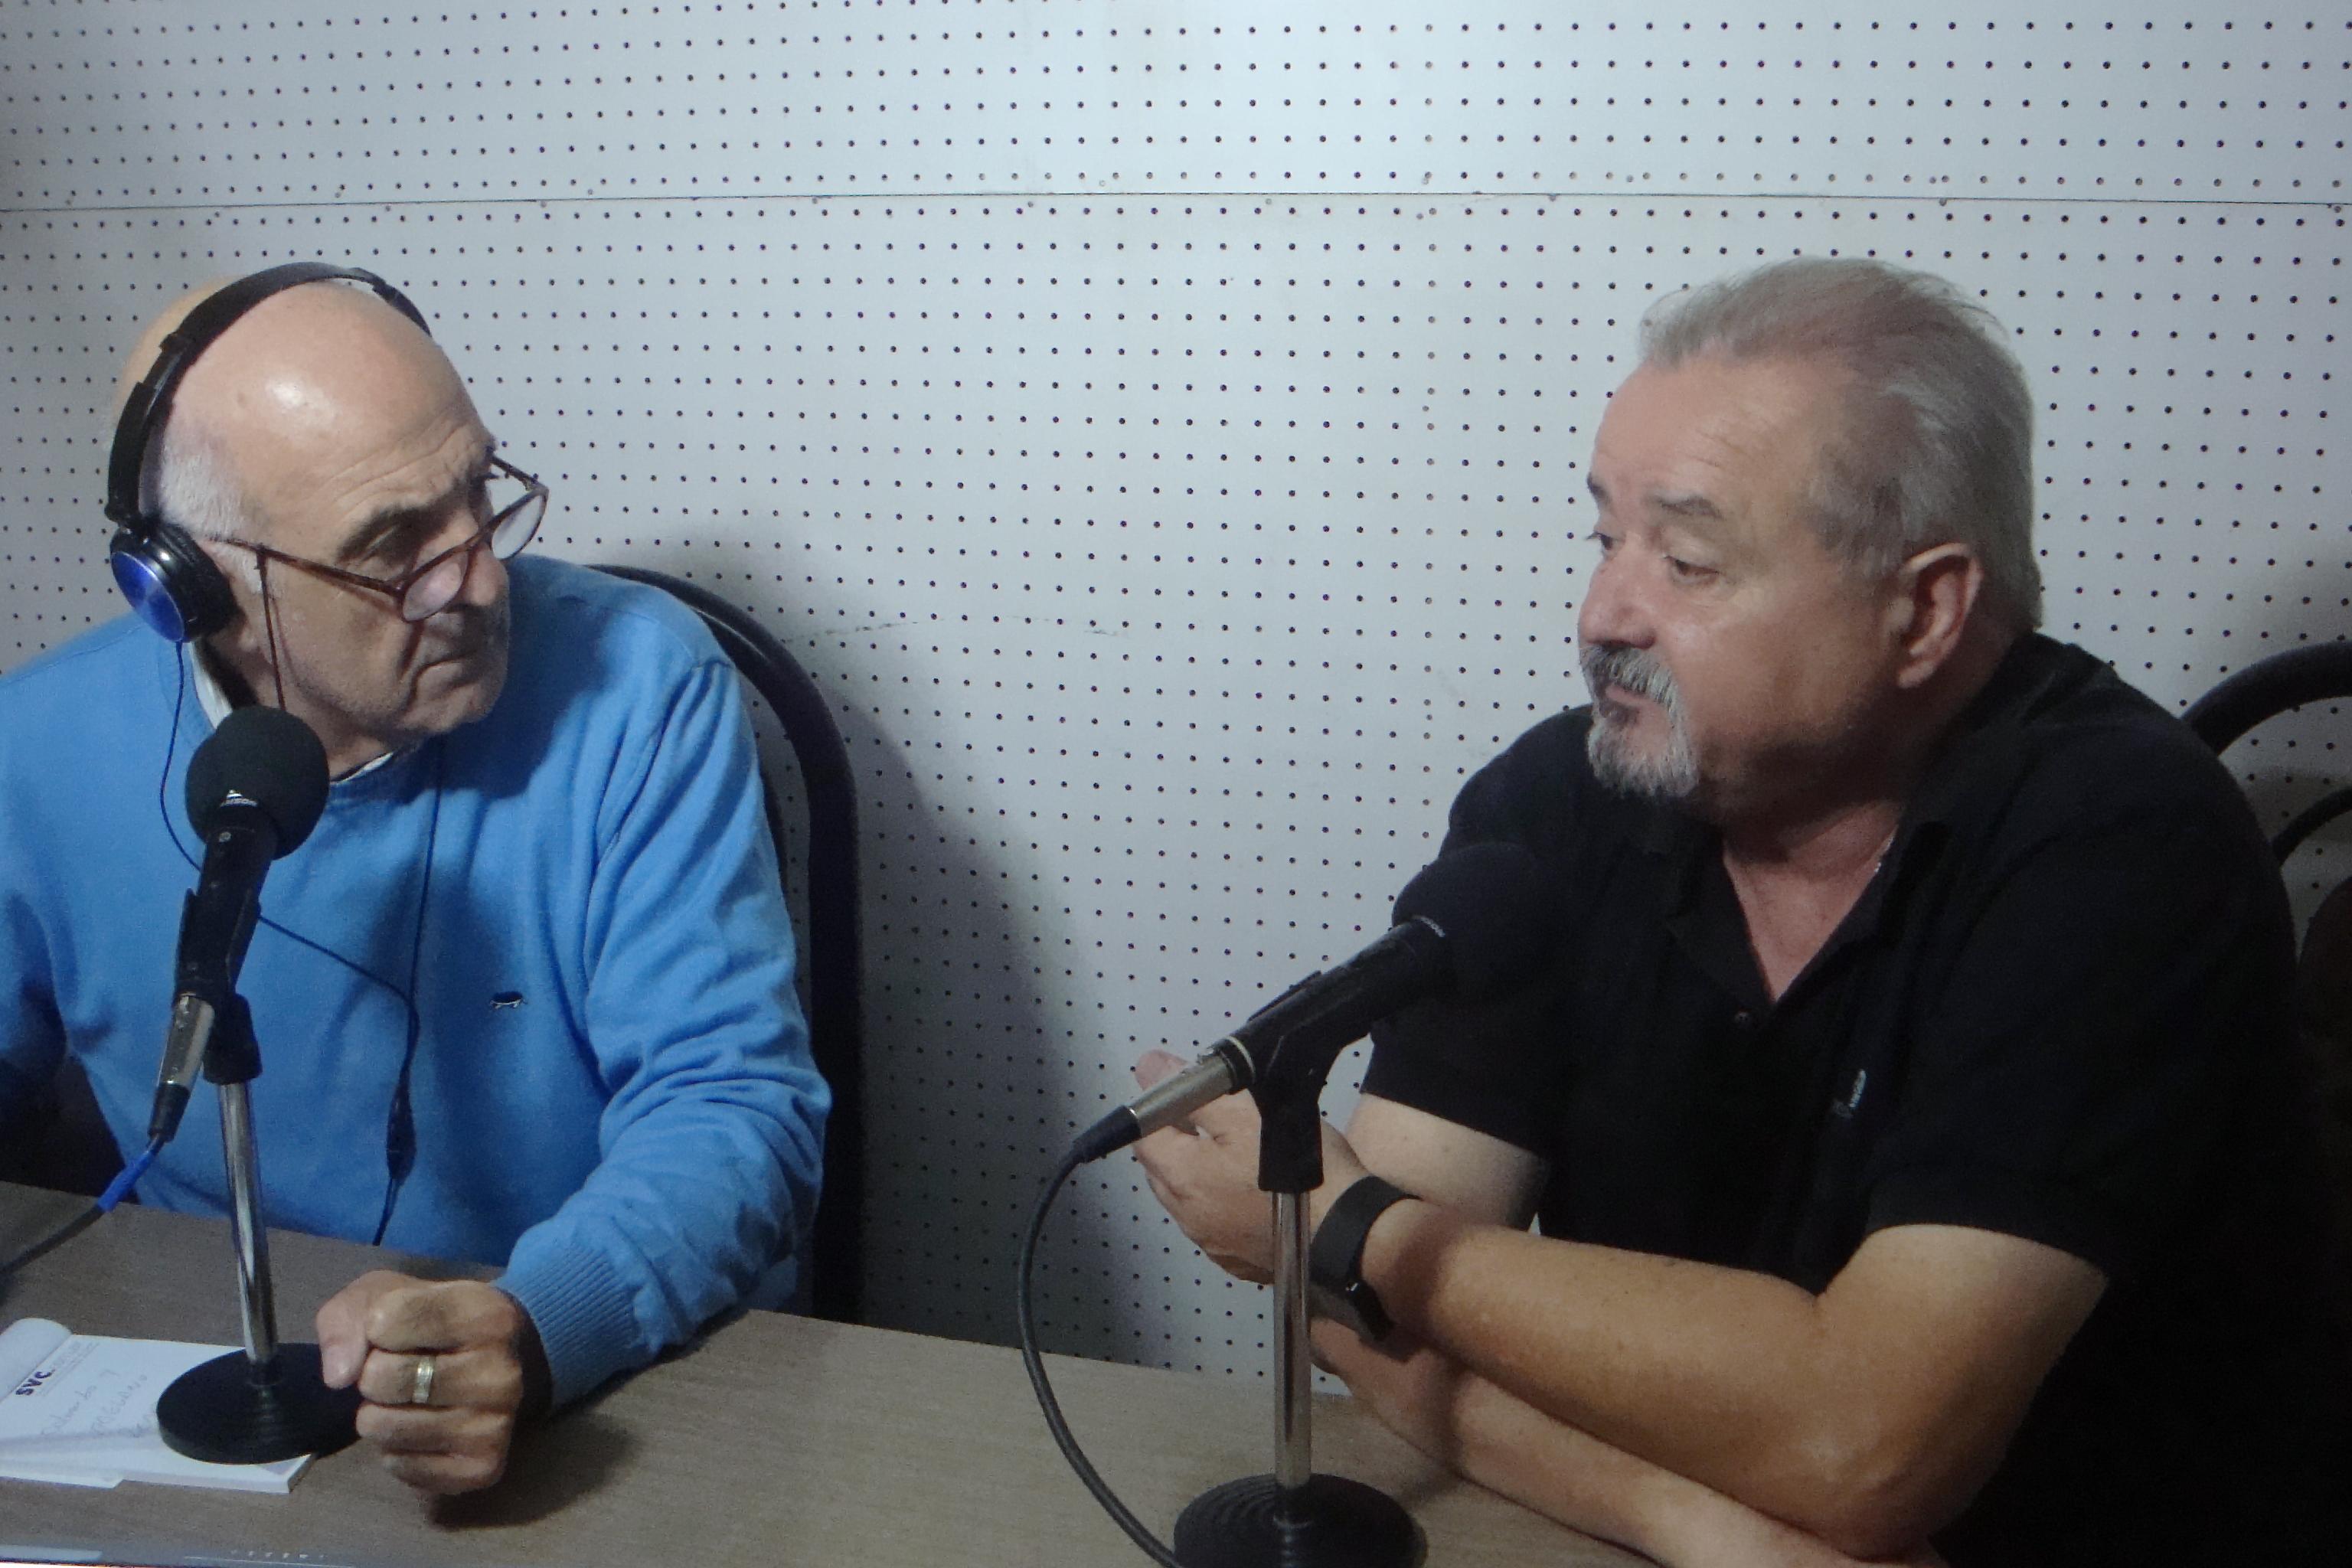 Final de una crónica anunciada: R. Uribarri pegó un portazo a la Cooperativa de Ranchos